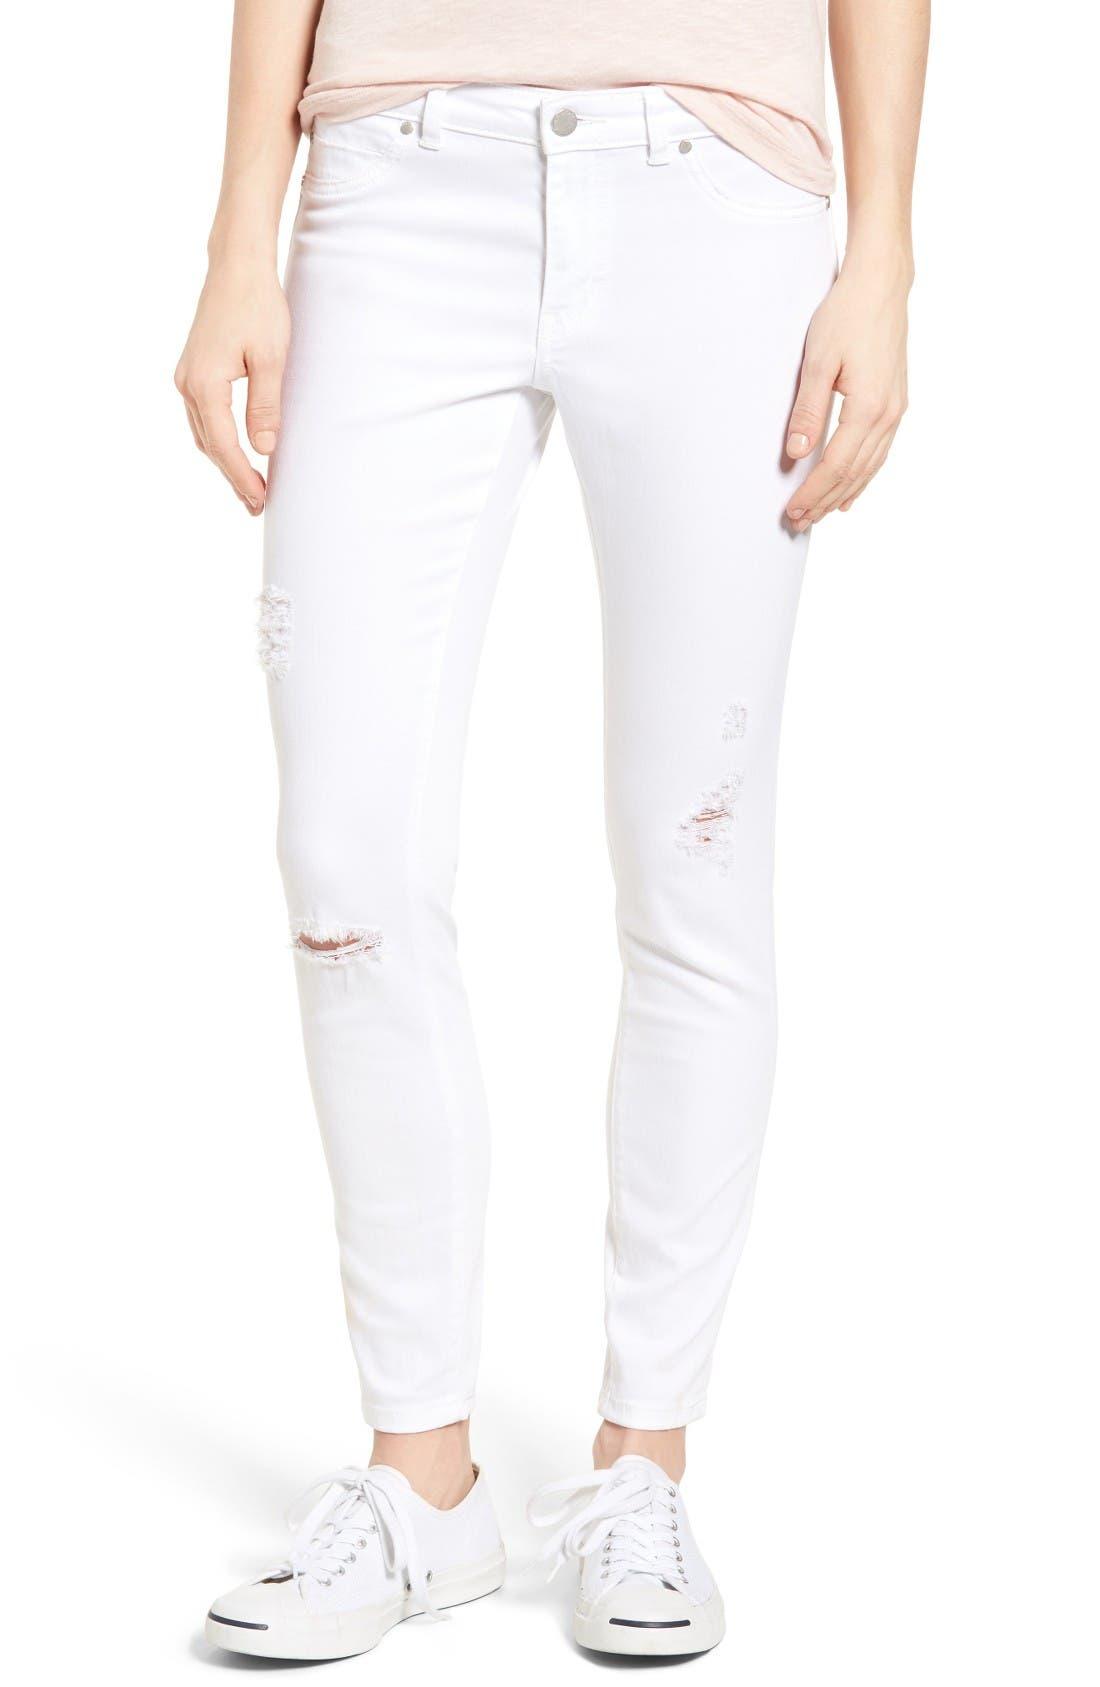 Alternate Image 1 Selected - Caslon® Distressed Skinny Jeans (Regular & Petite)